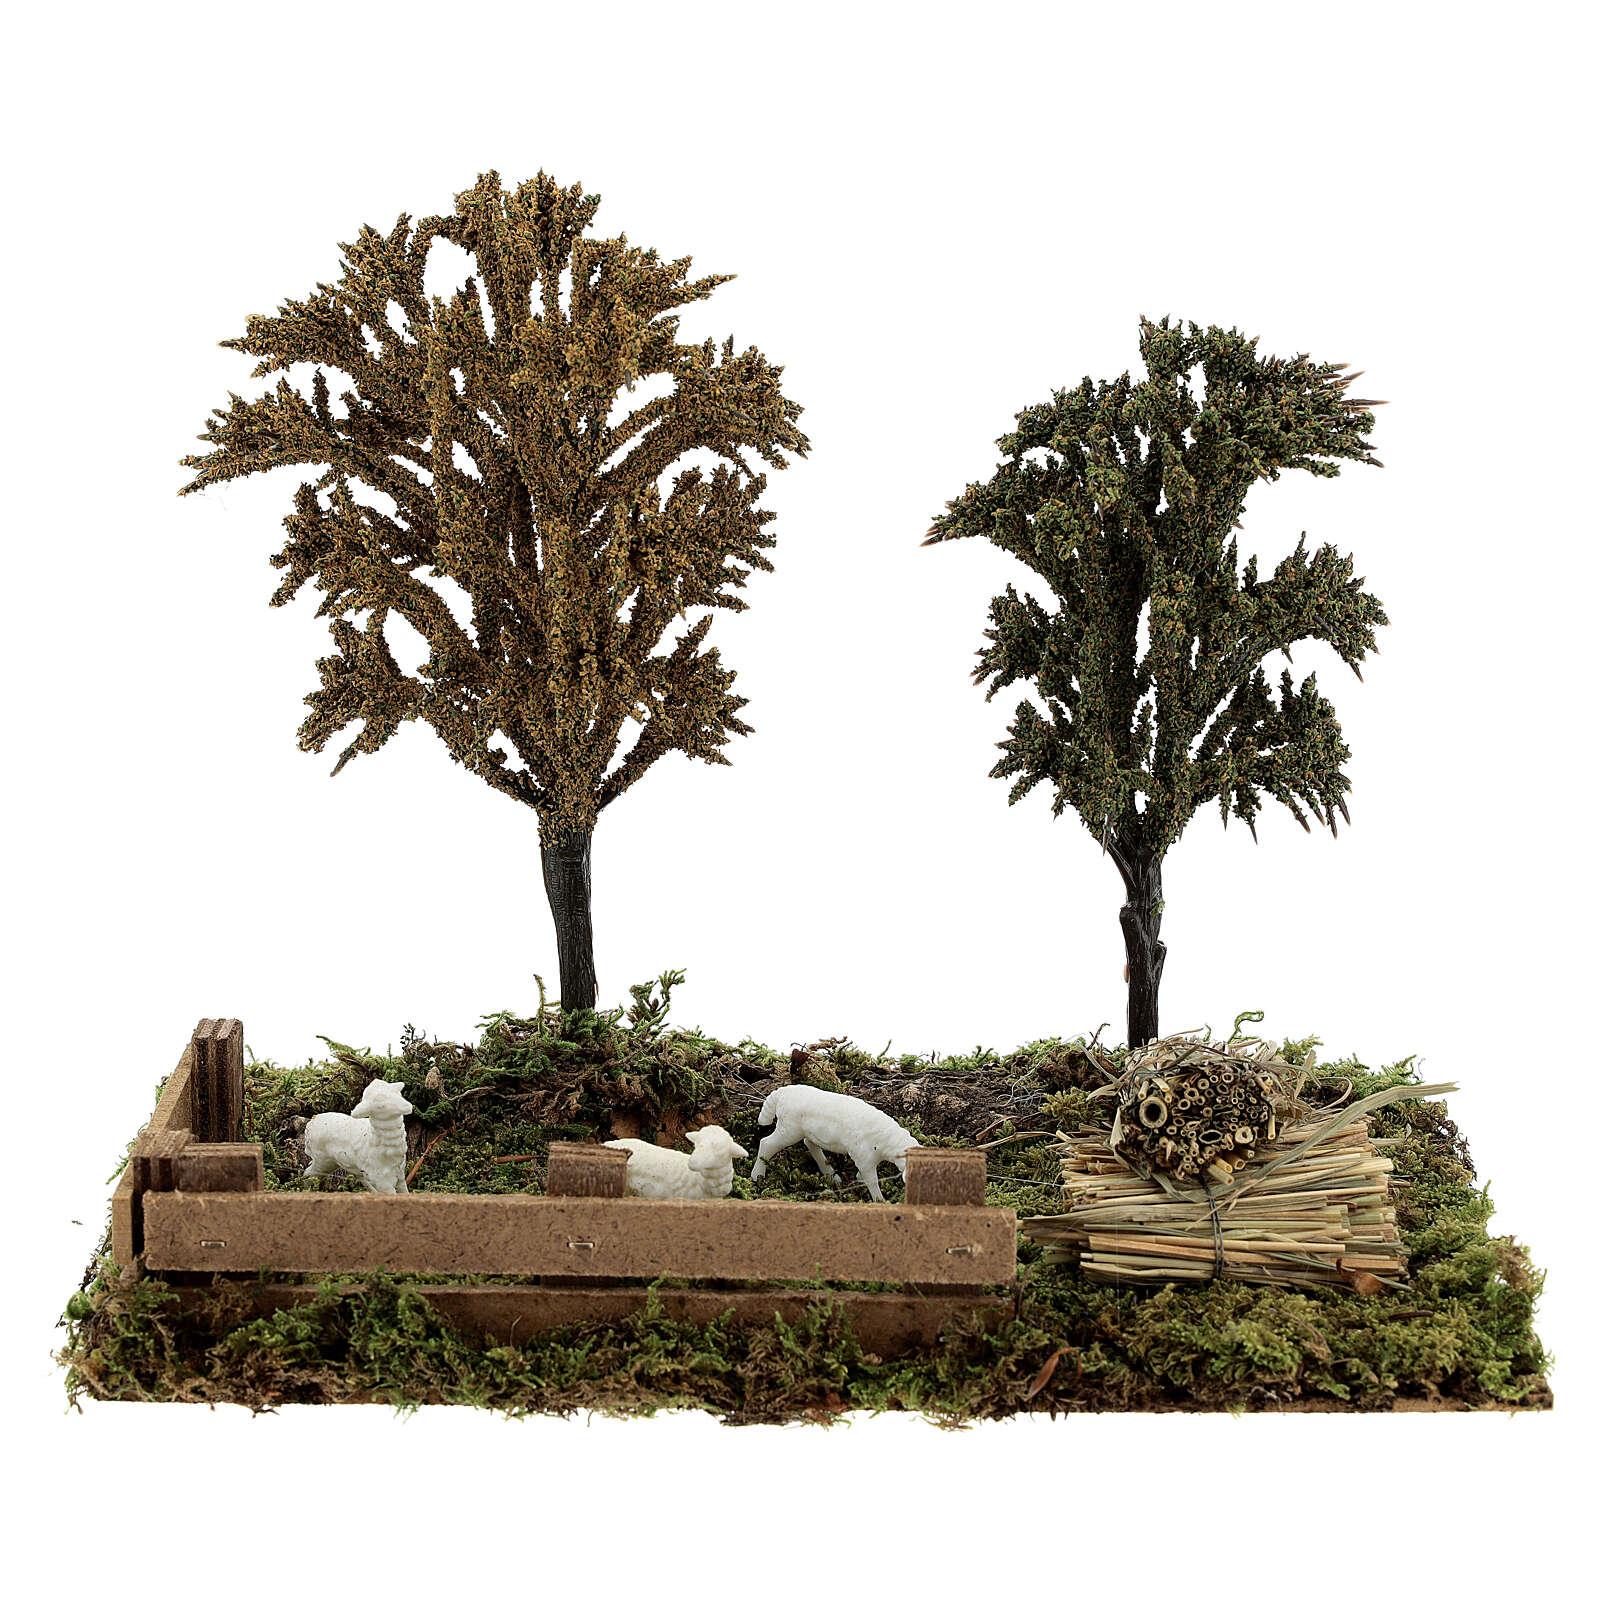 Miniature grove with sheep, 8-10 cm nativity 25x20x15 cm 4